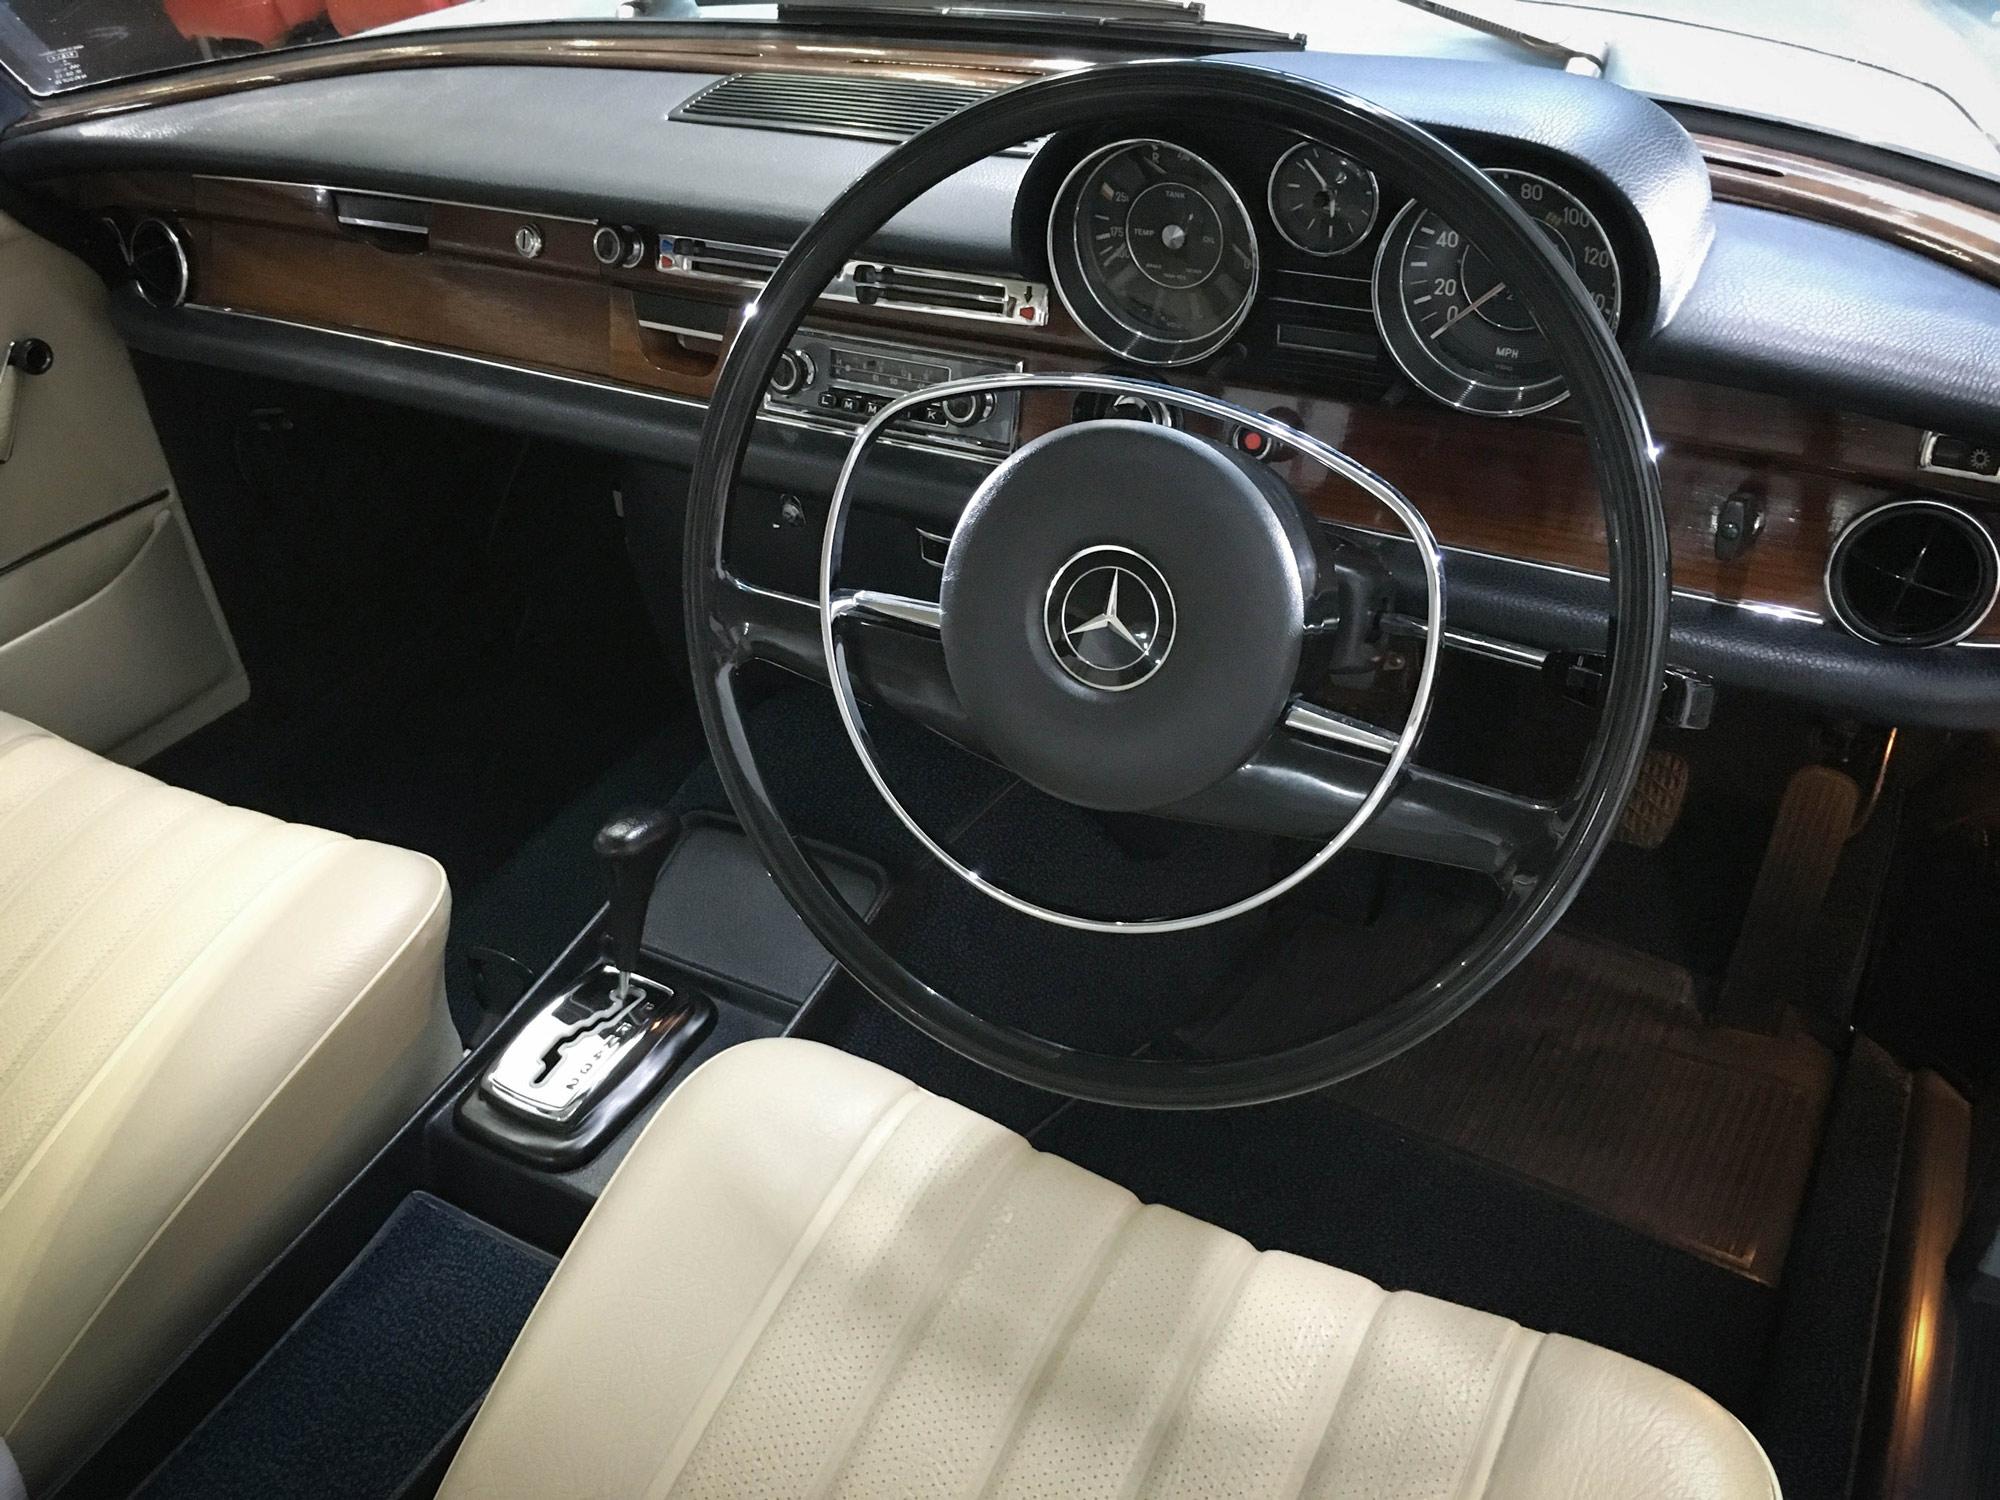 Mercedes_280se-driving-wheel